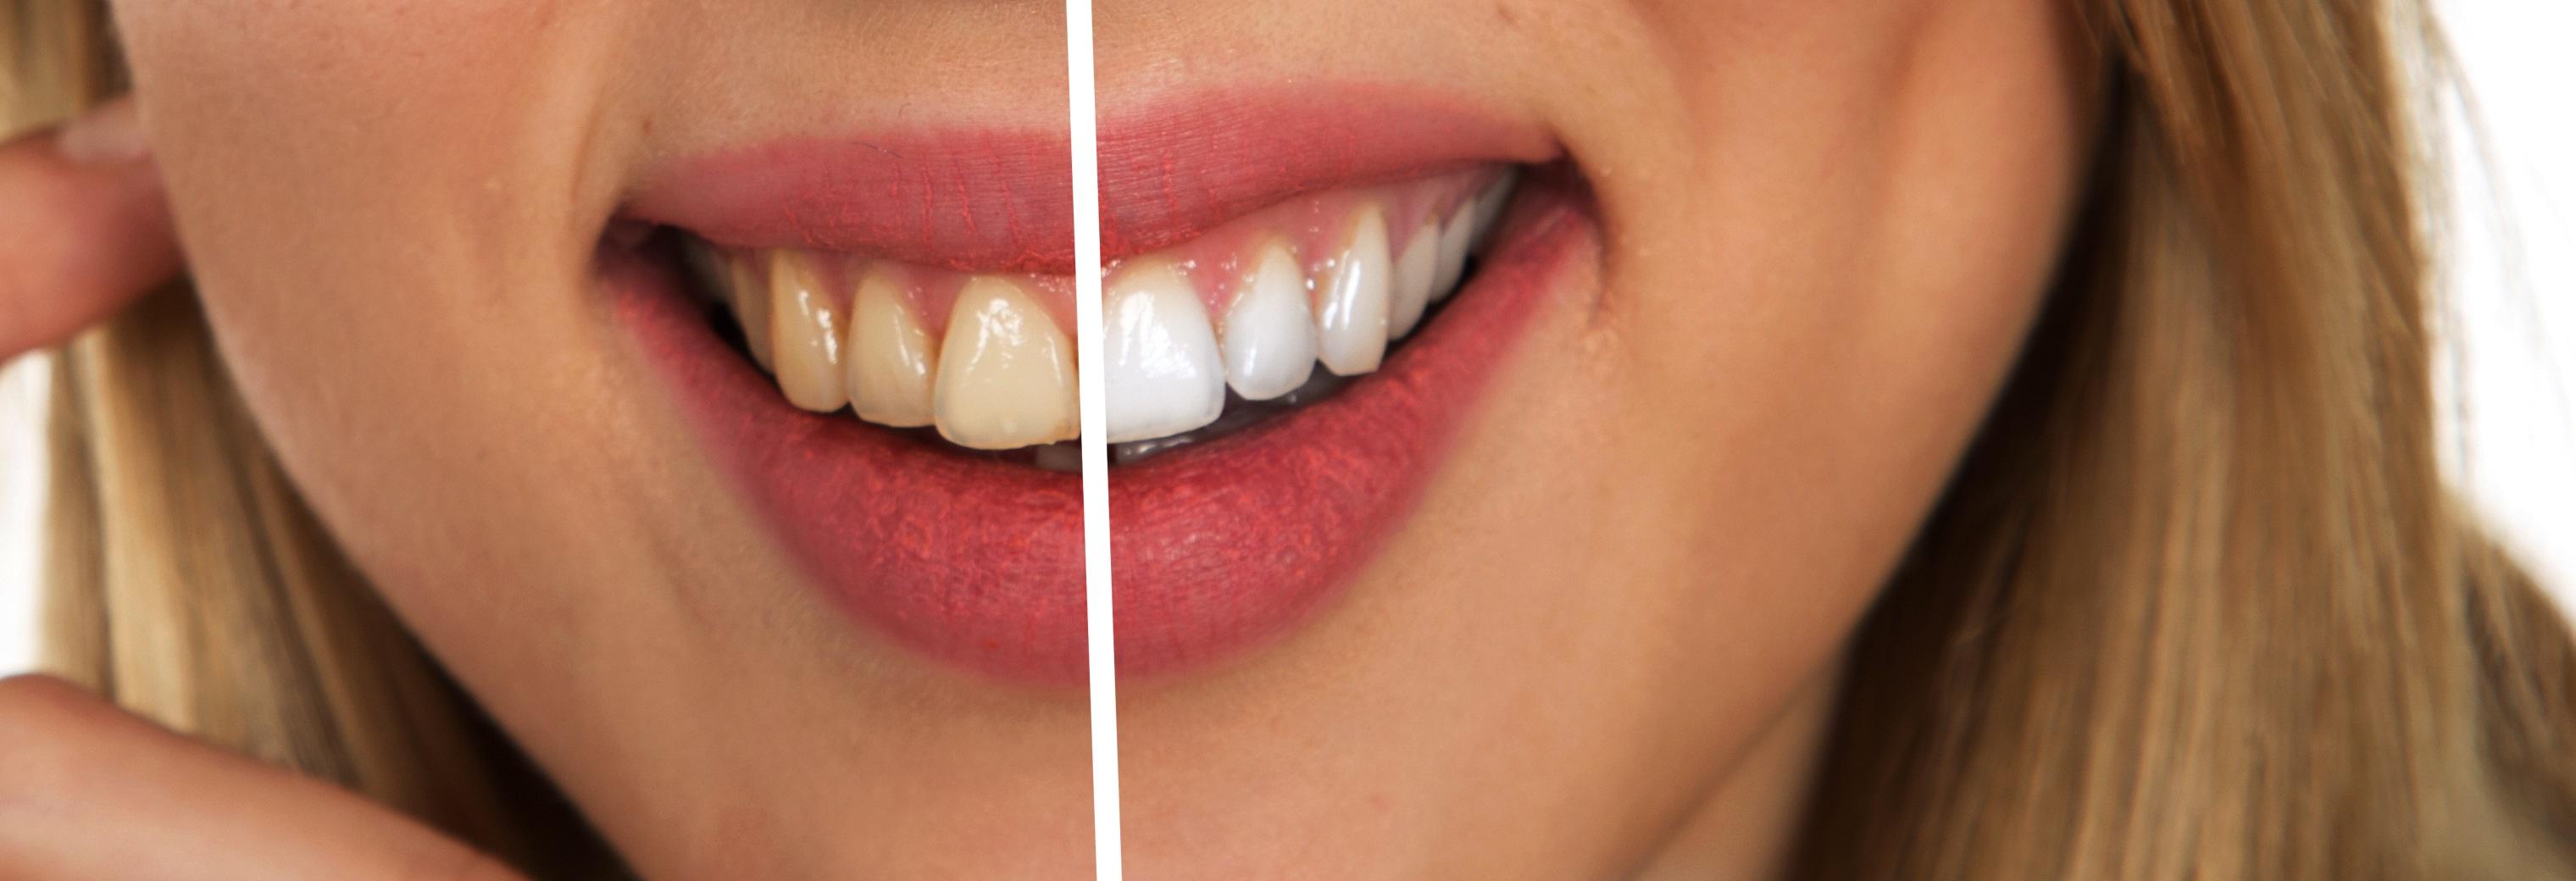 Teeth Whitening Cosmetic Dentistry Dr Richard Epstein